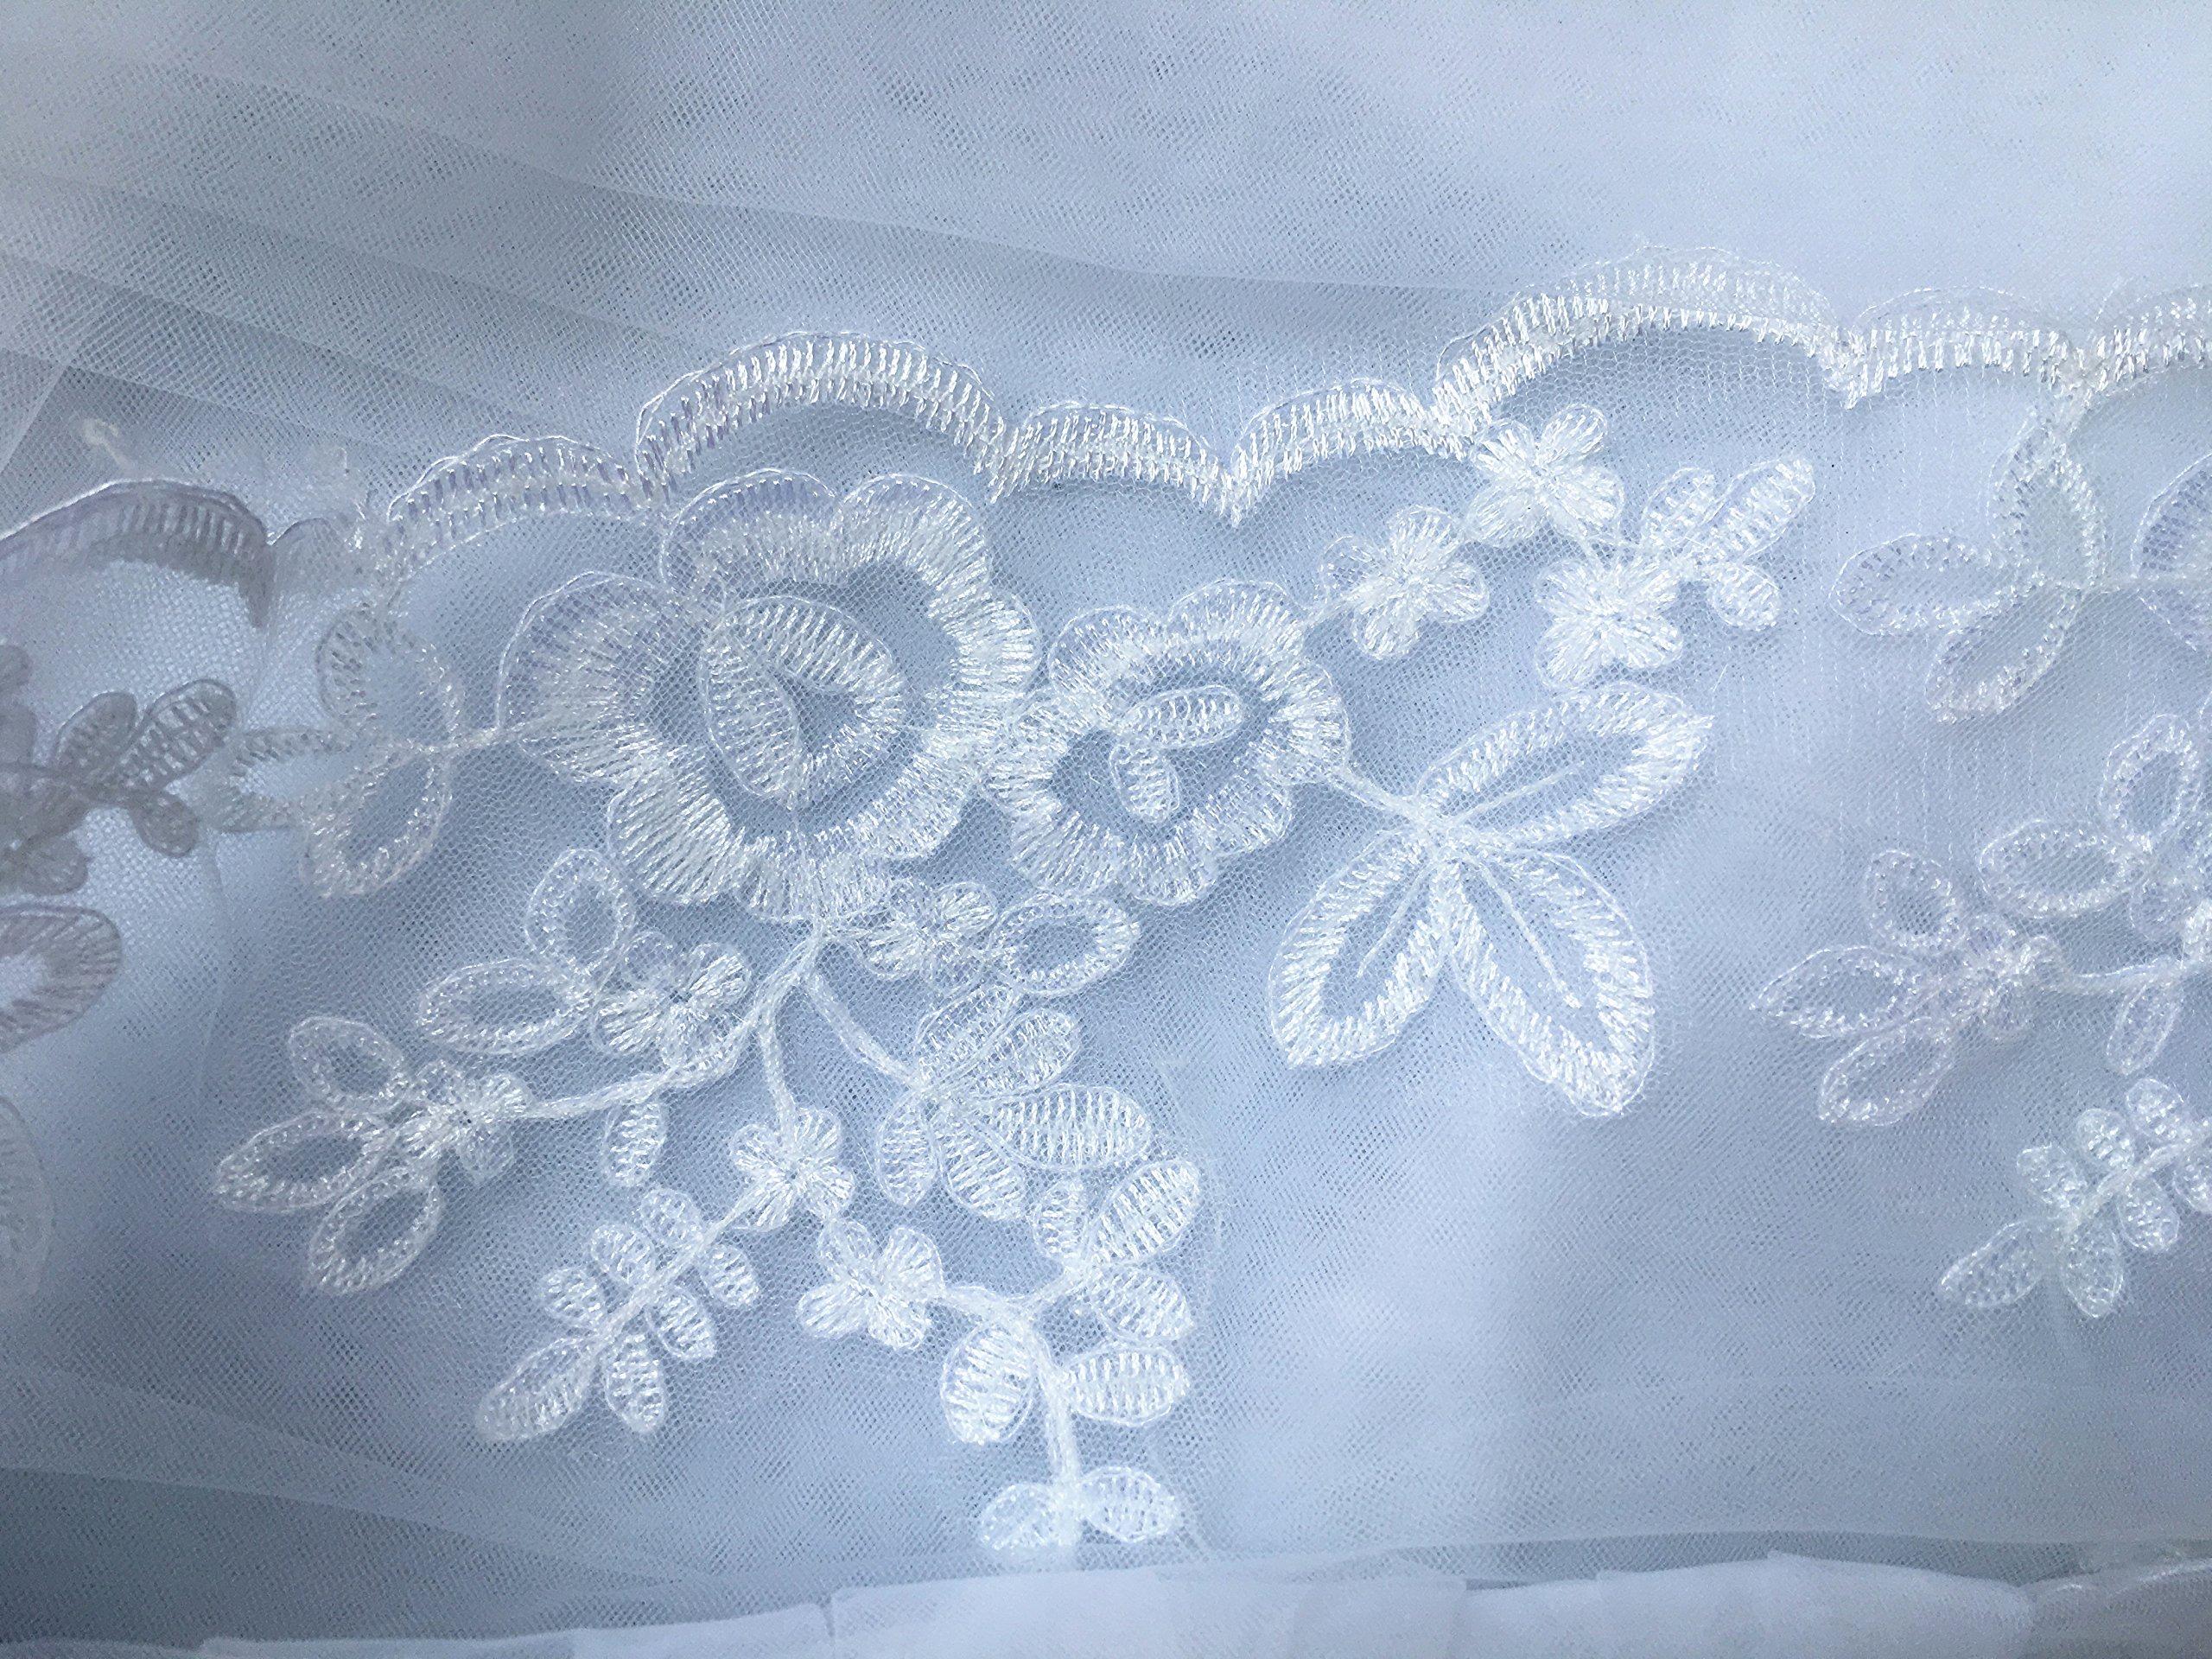 Single Layer Wedding Veil Lianshi Bridal Veil Lace Embroidery Bride Supplies 3m (Off White) by Lianshi